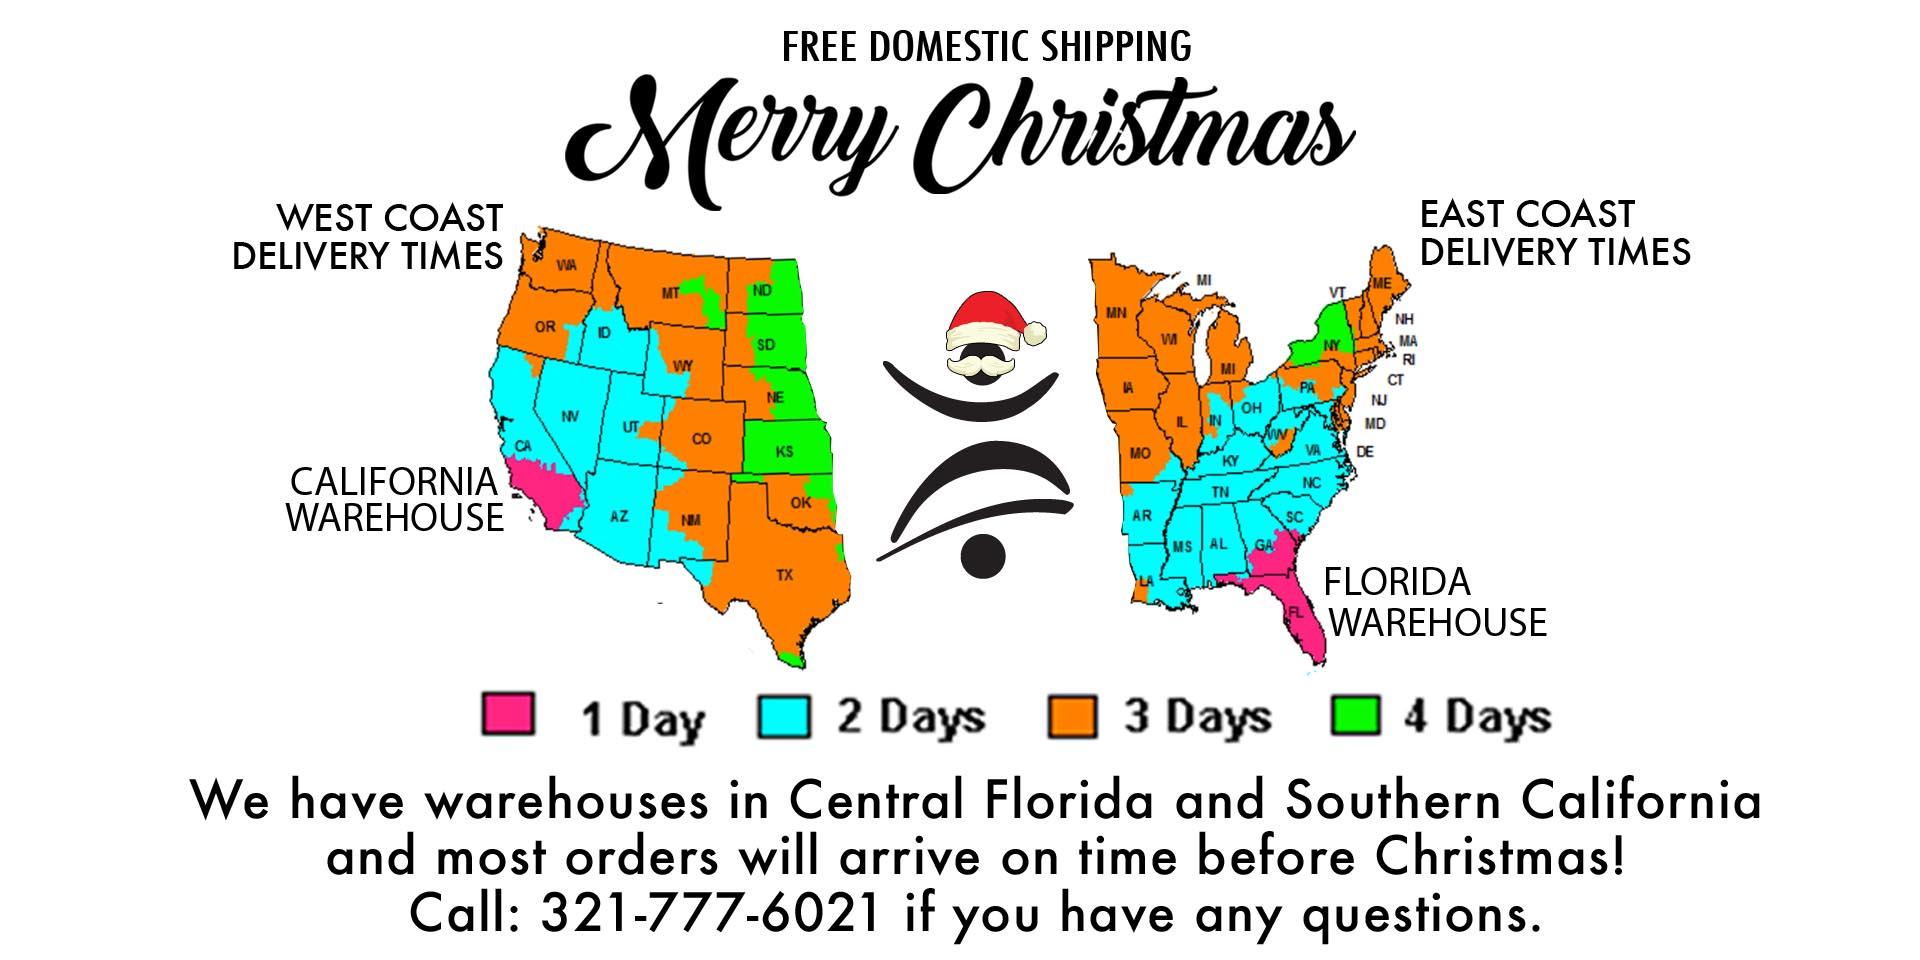 christmas-shipping-times-slide4.jpg